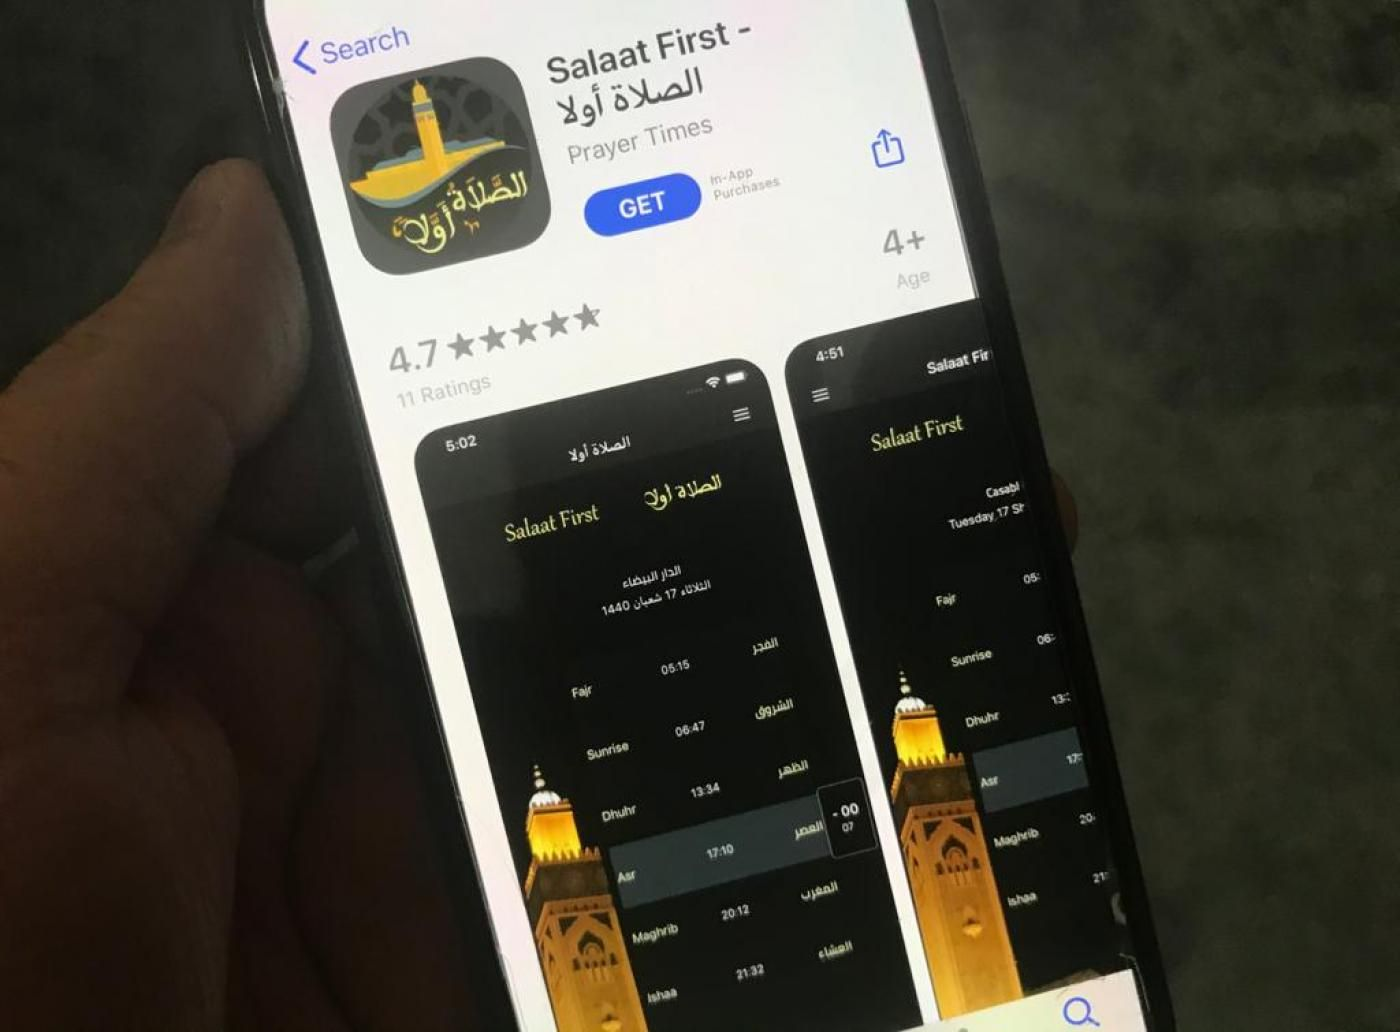 A screen shot of the Salaat First app for prayer times